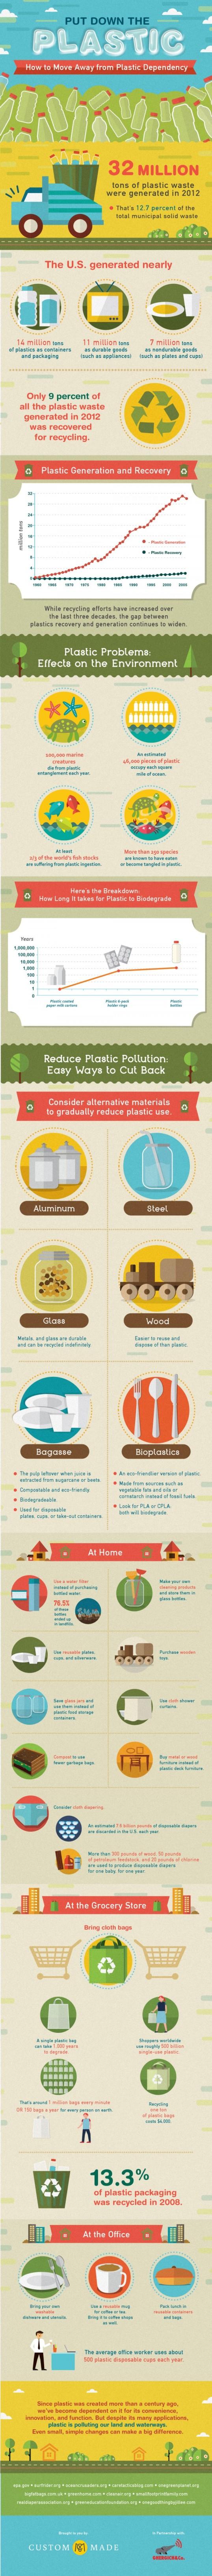 plastic infographic